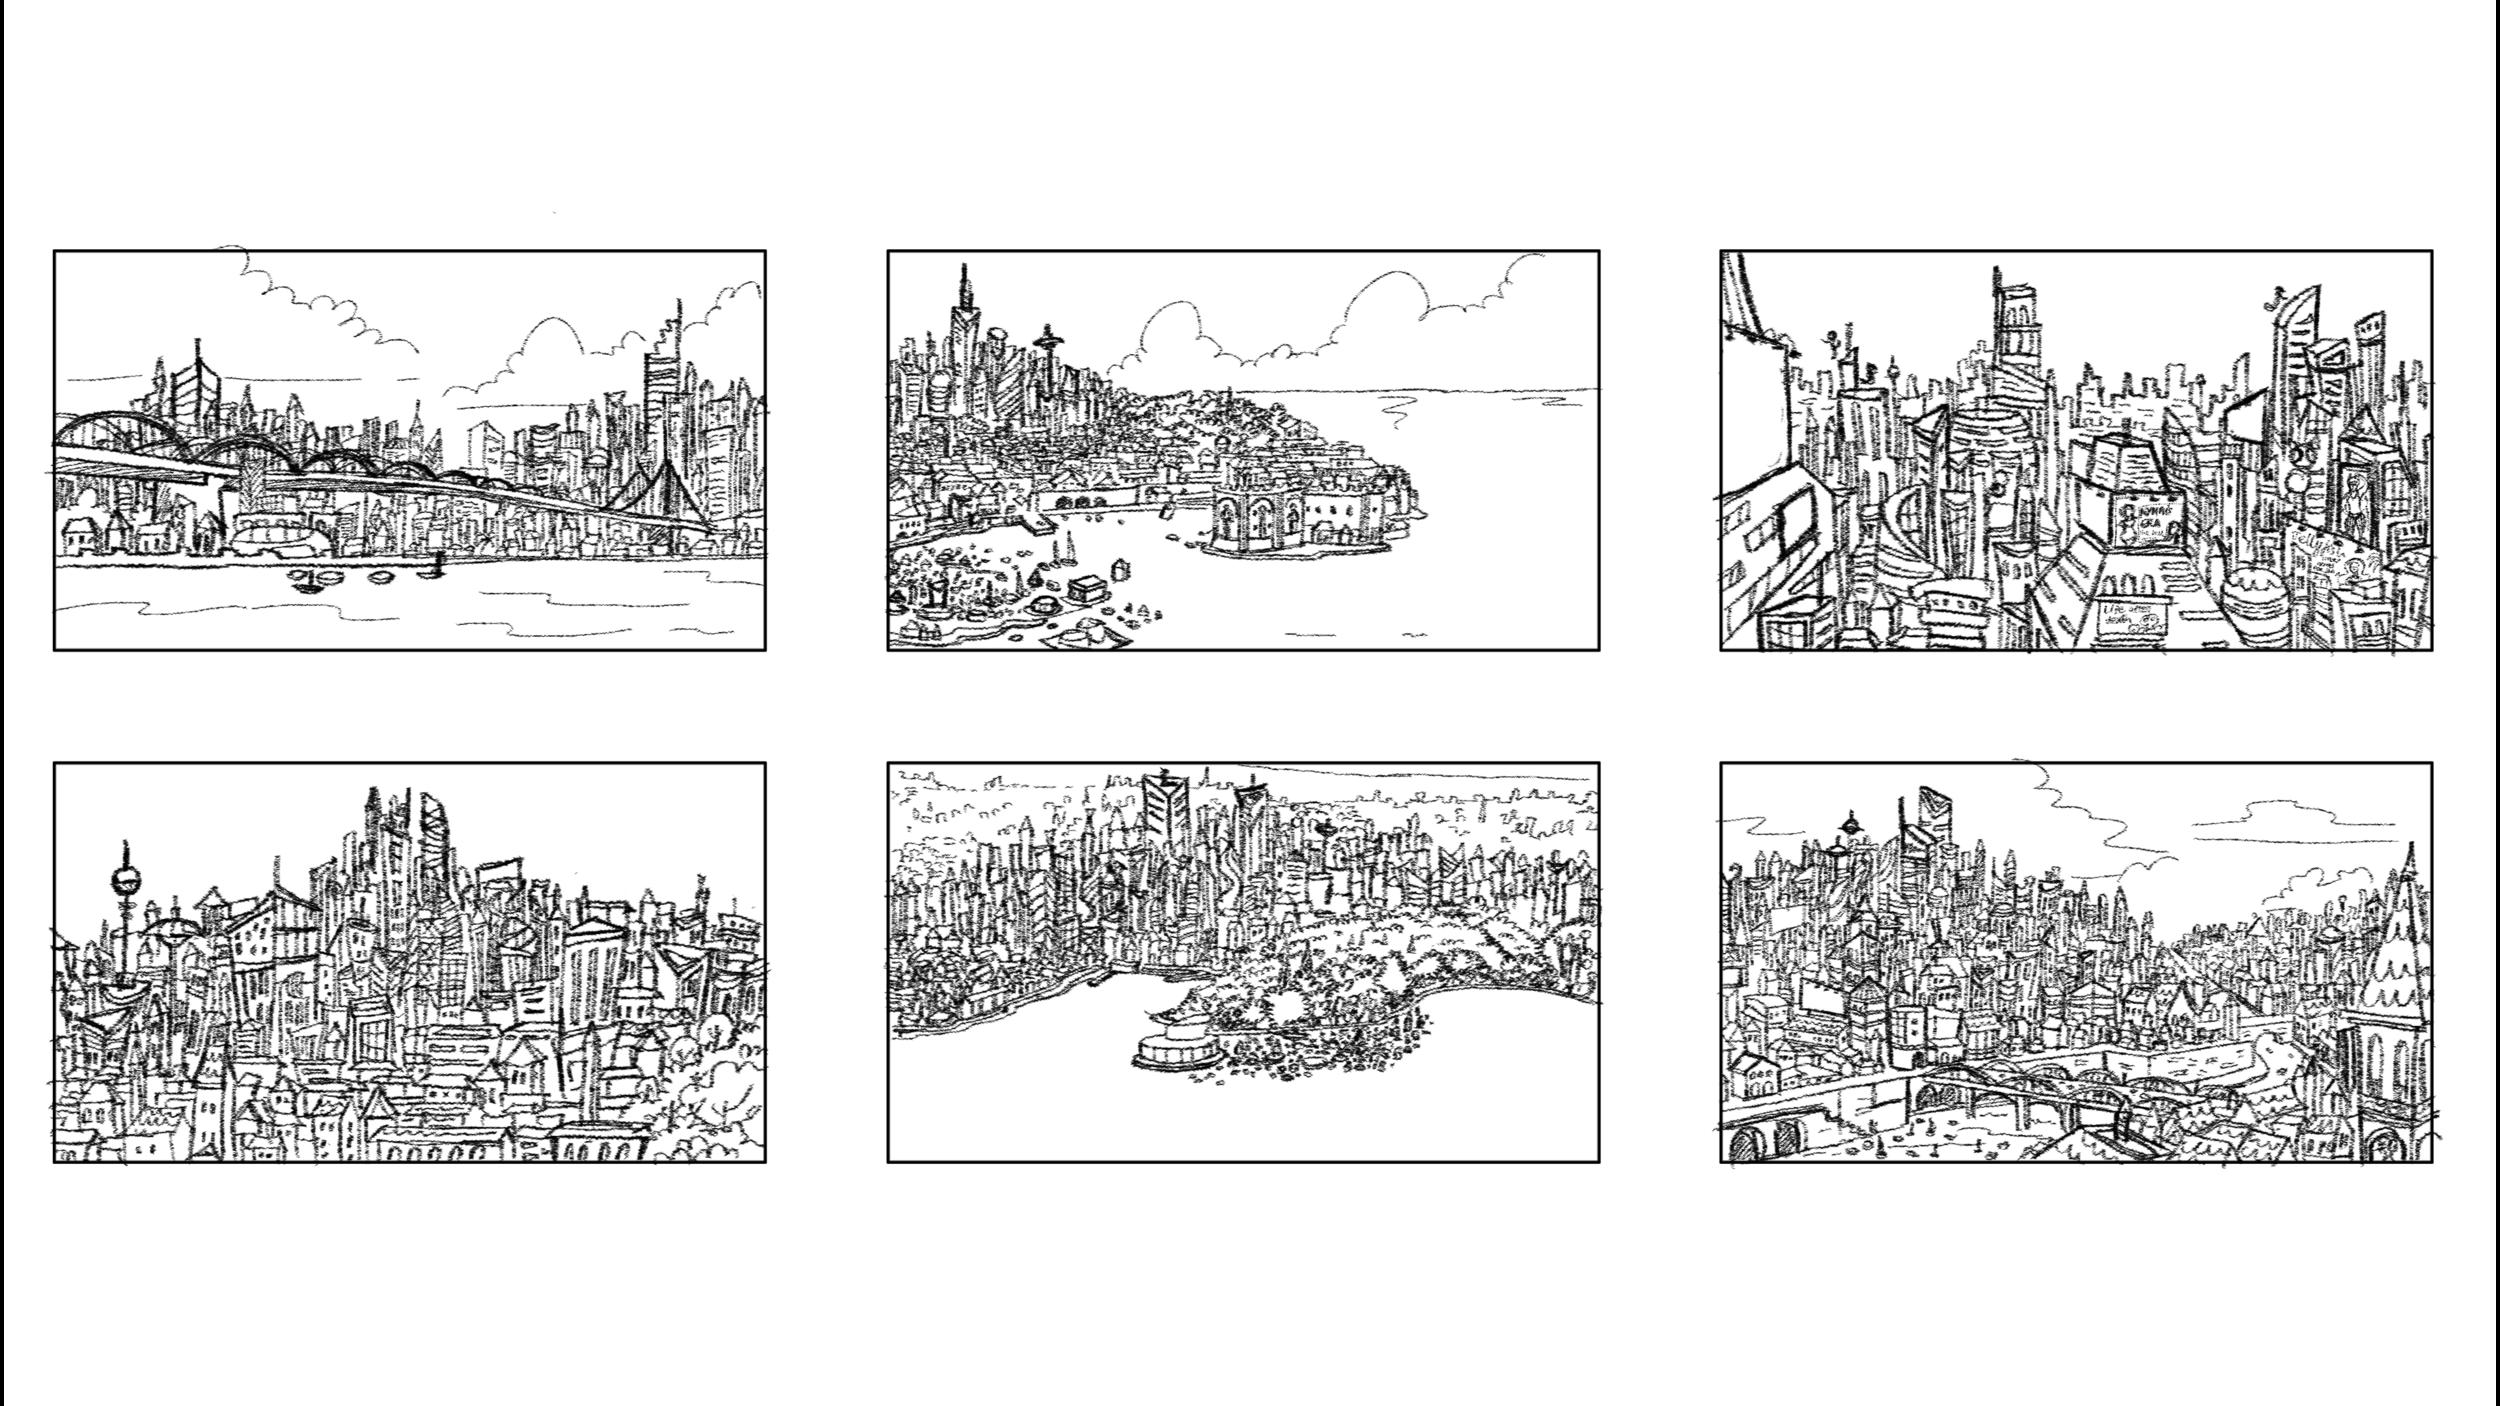 City establishing shot: Explorations